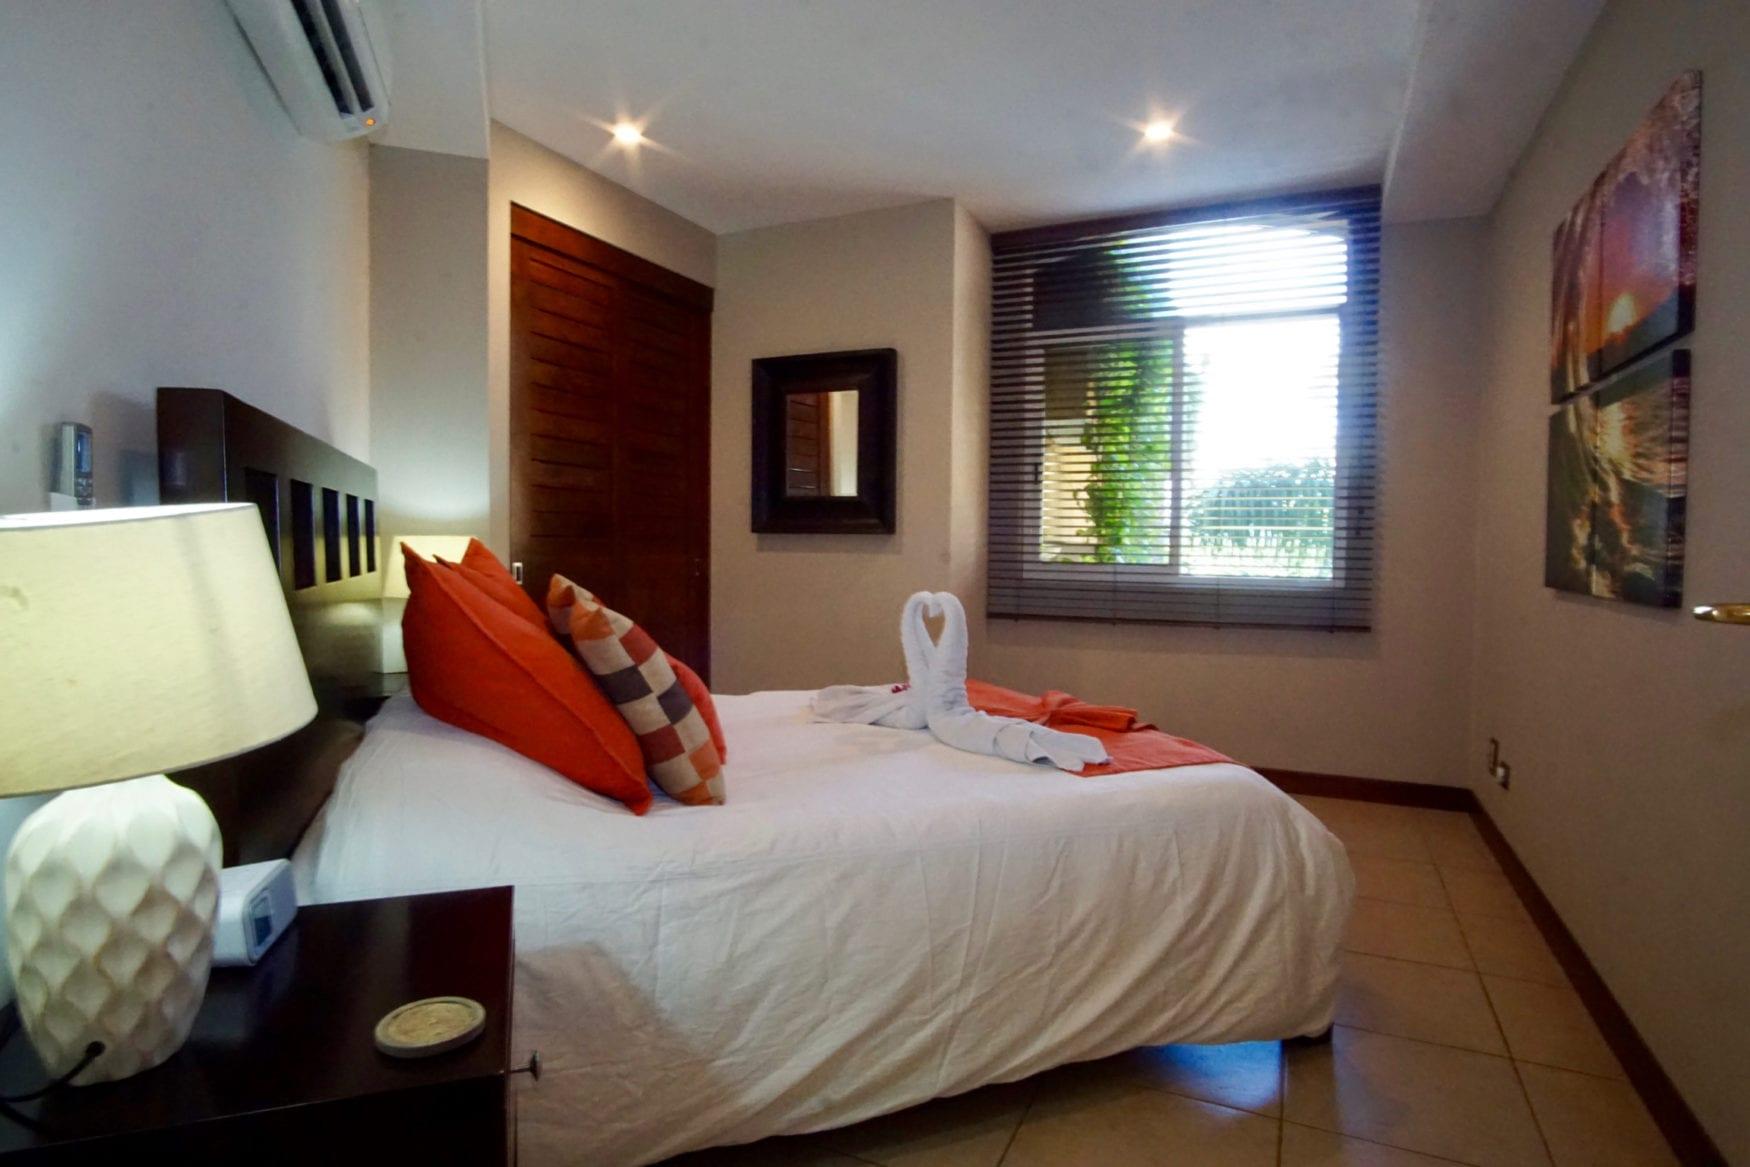 Peninsula Bedroom 2